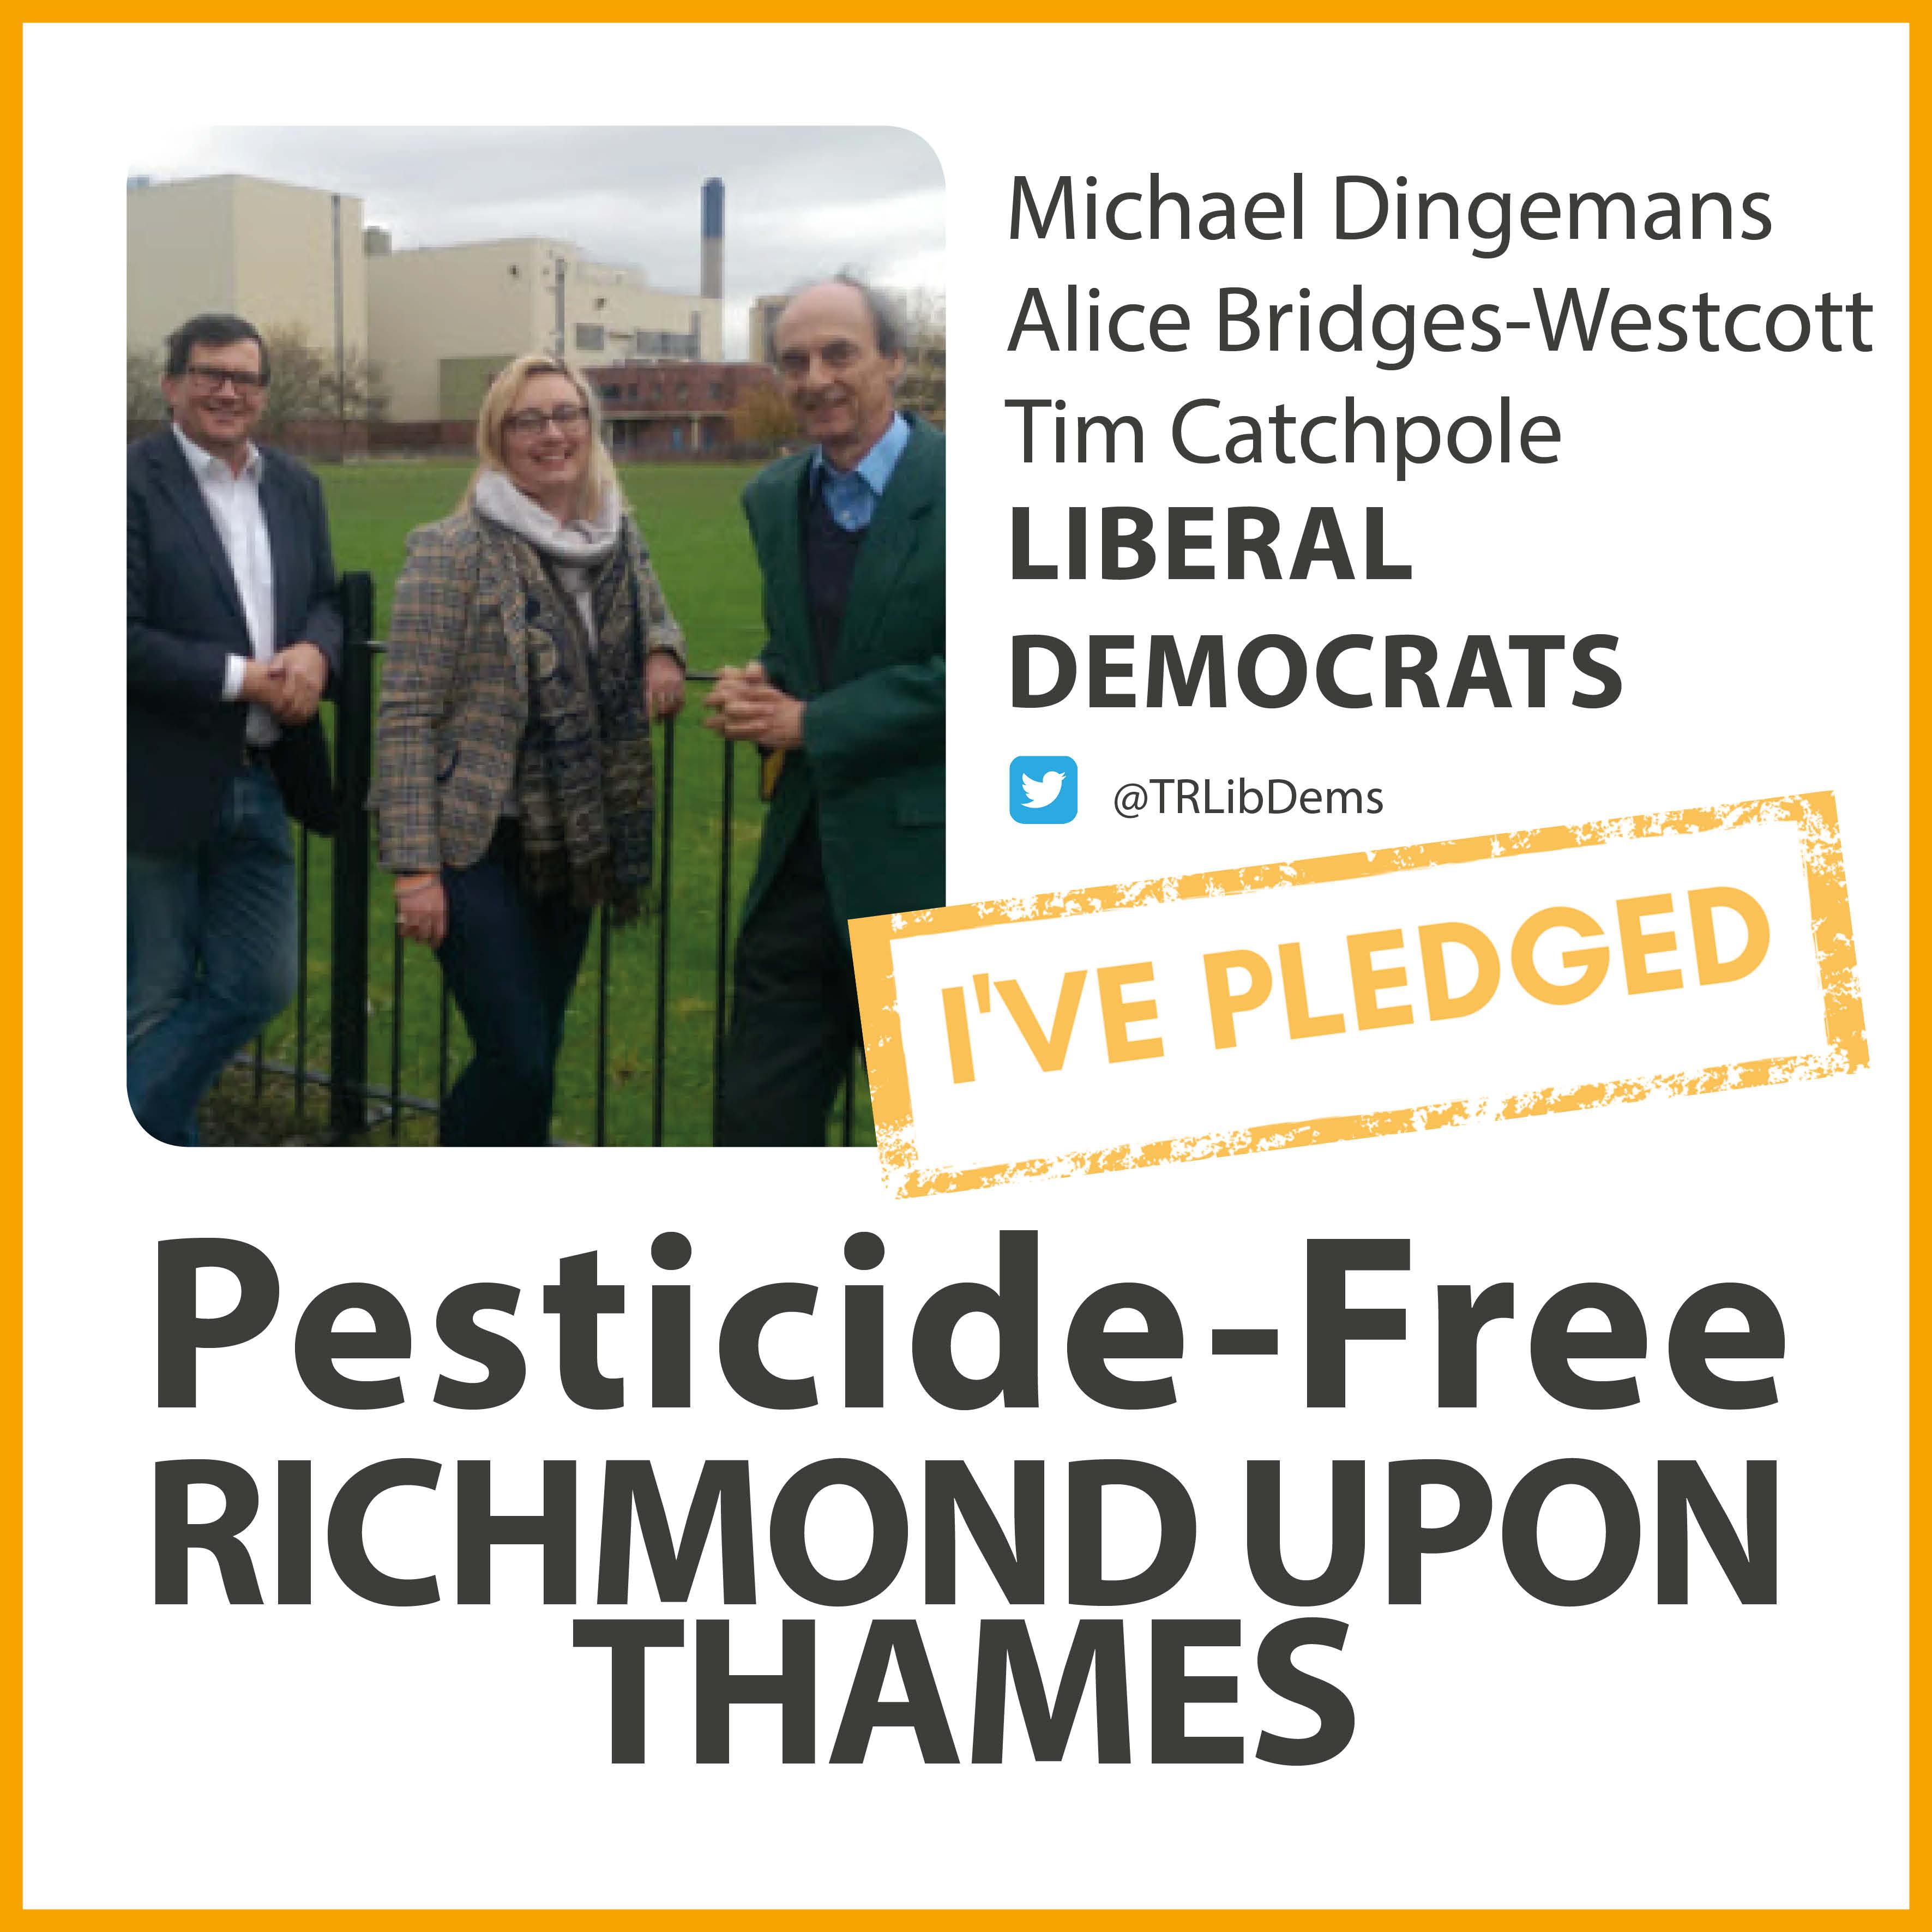 Mortlake and Barnes Common Lib Dems have taken the pesticide-free pledge